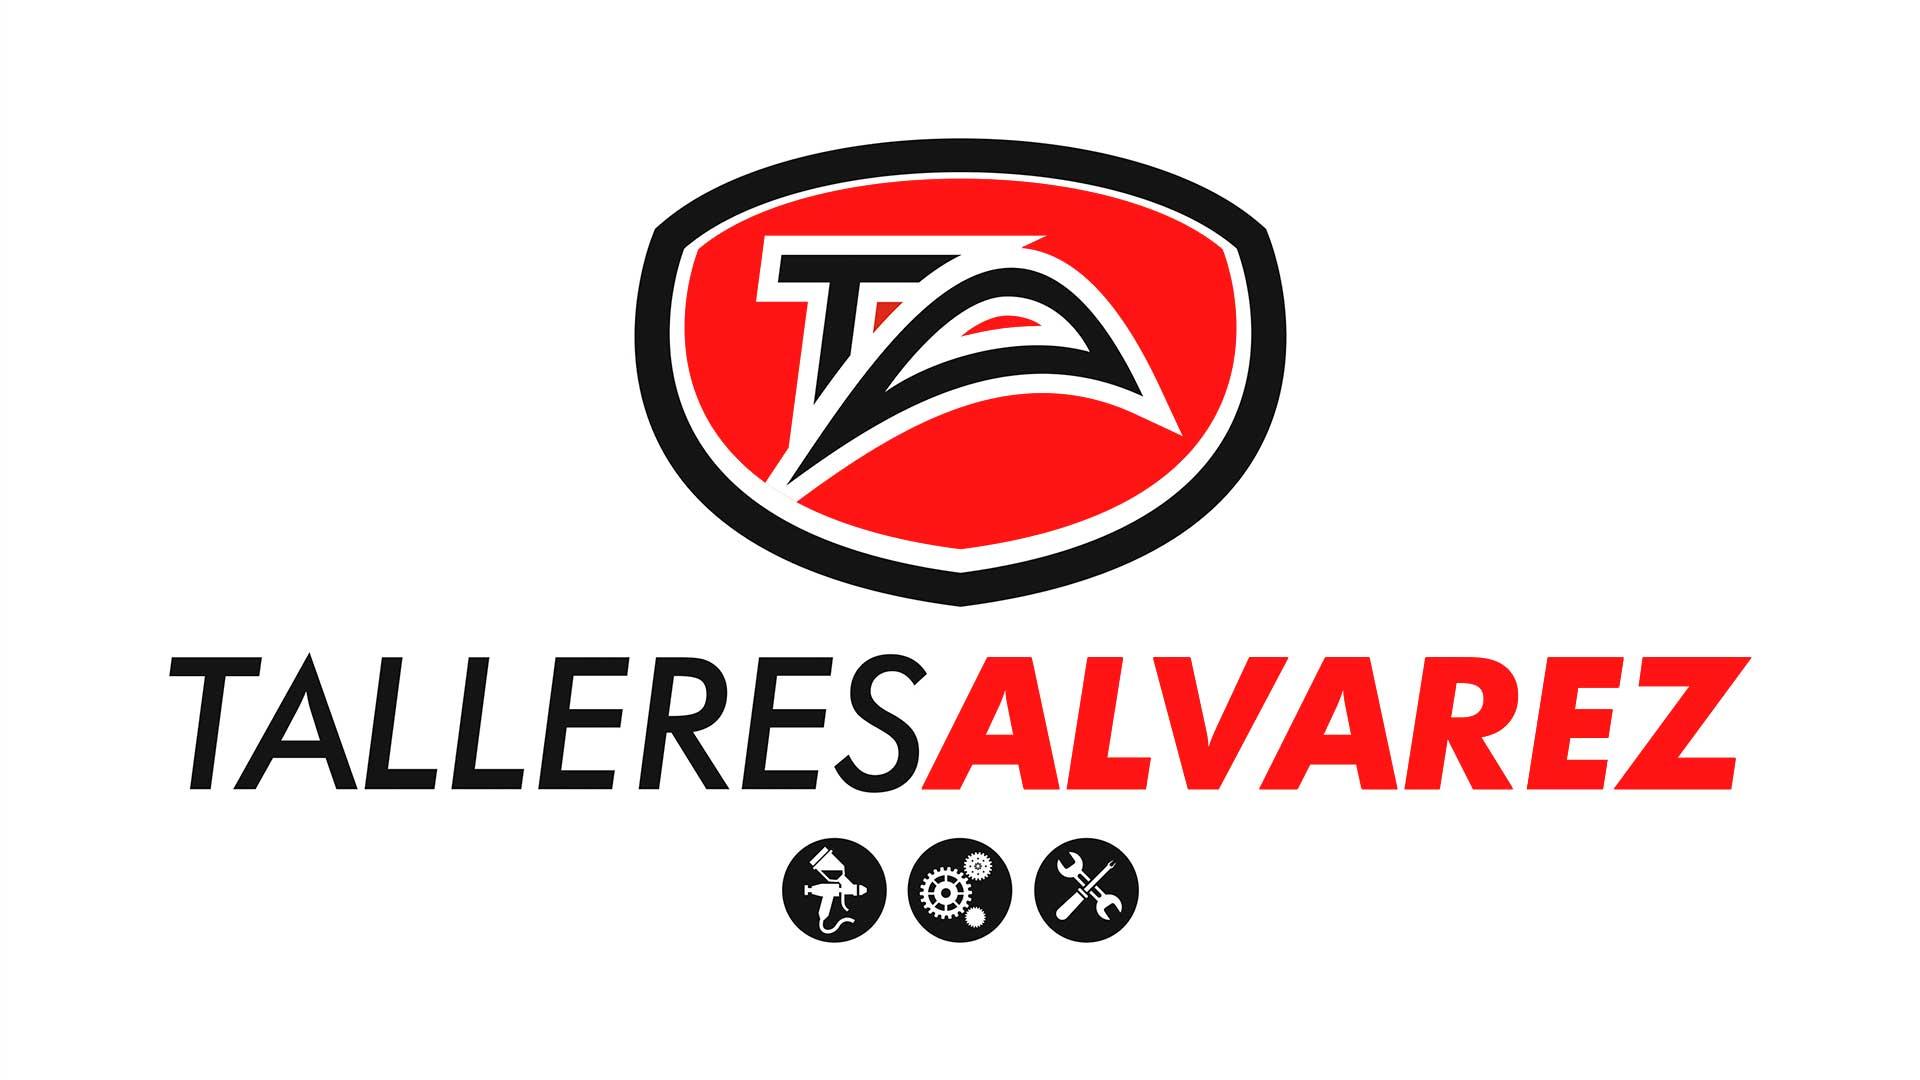 TALLERES-ALVAREZ